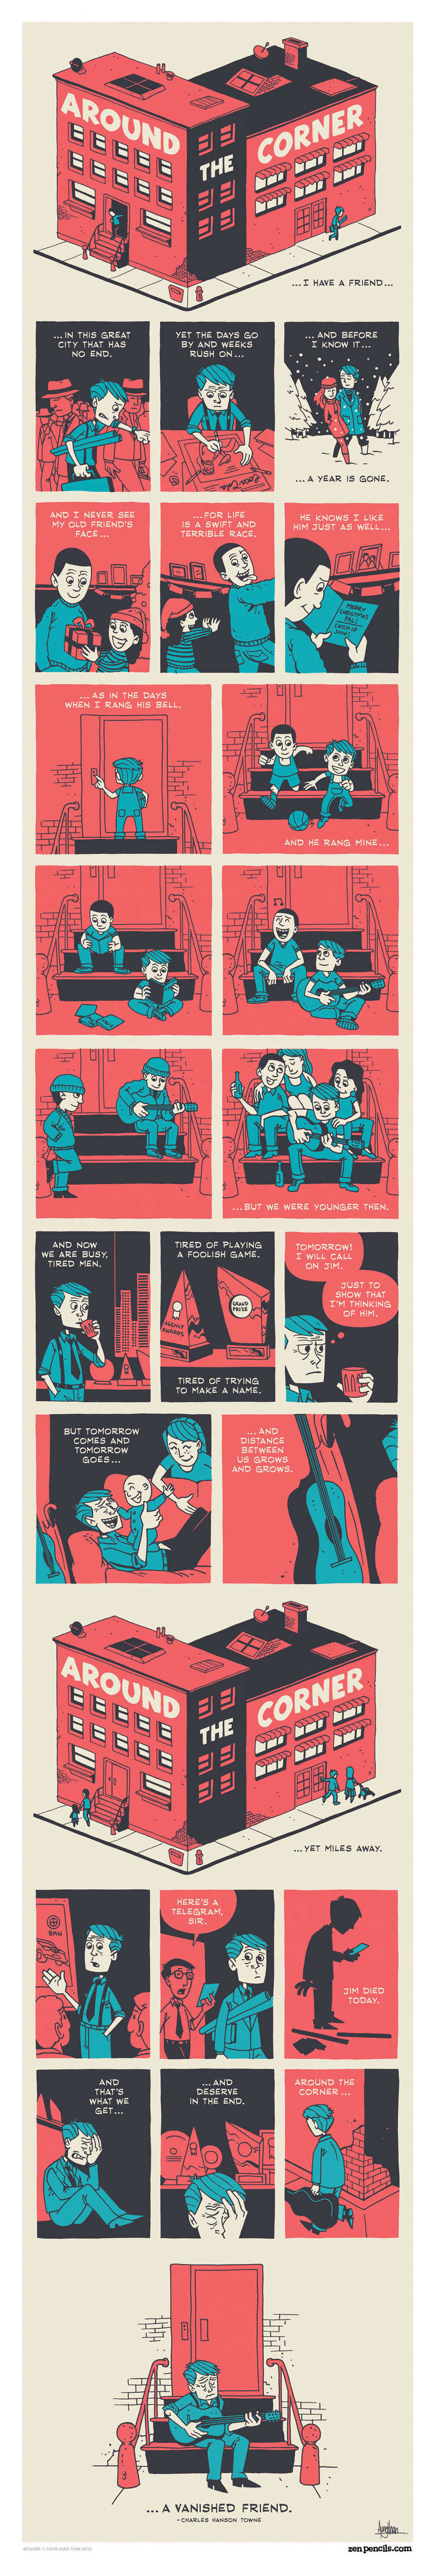 Zen Pencils Comic Strip for November 14, 2016